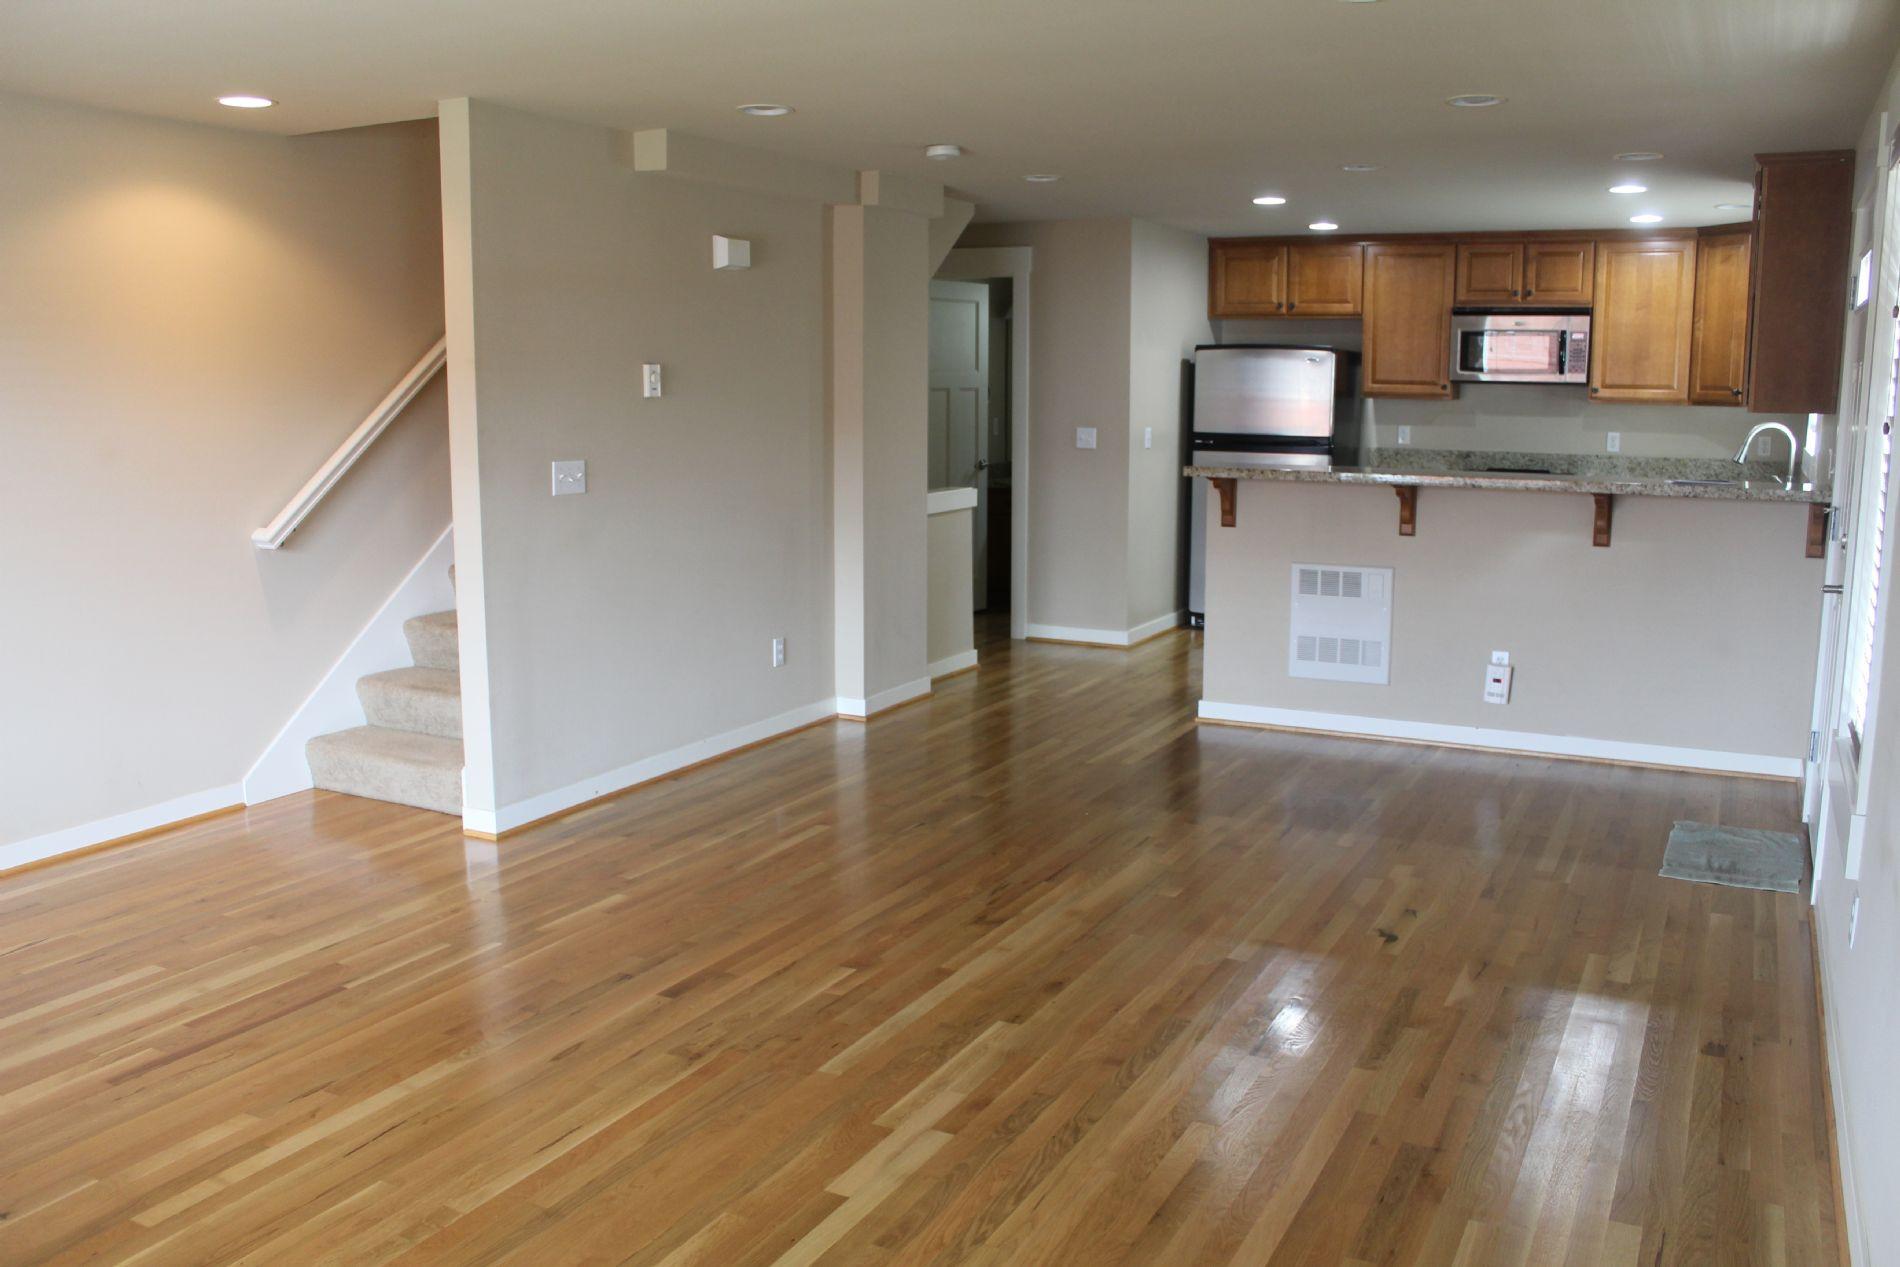 hardwood flooring belmont nc of real estate listings for sale regarding 3 jpg